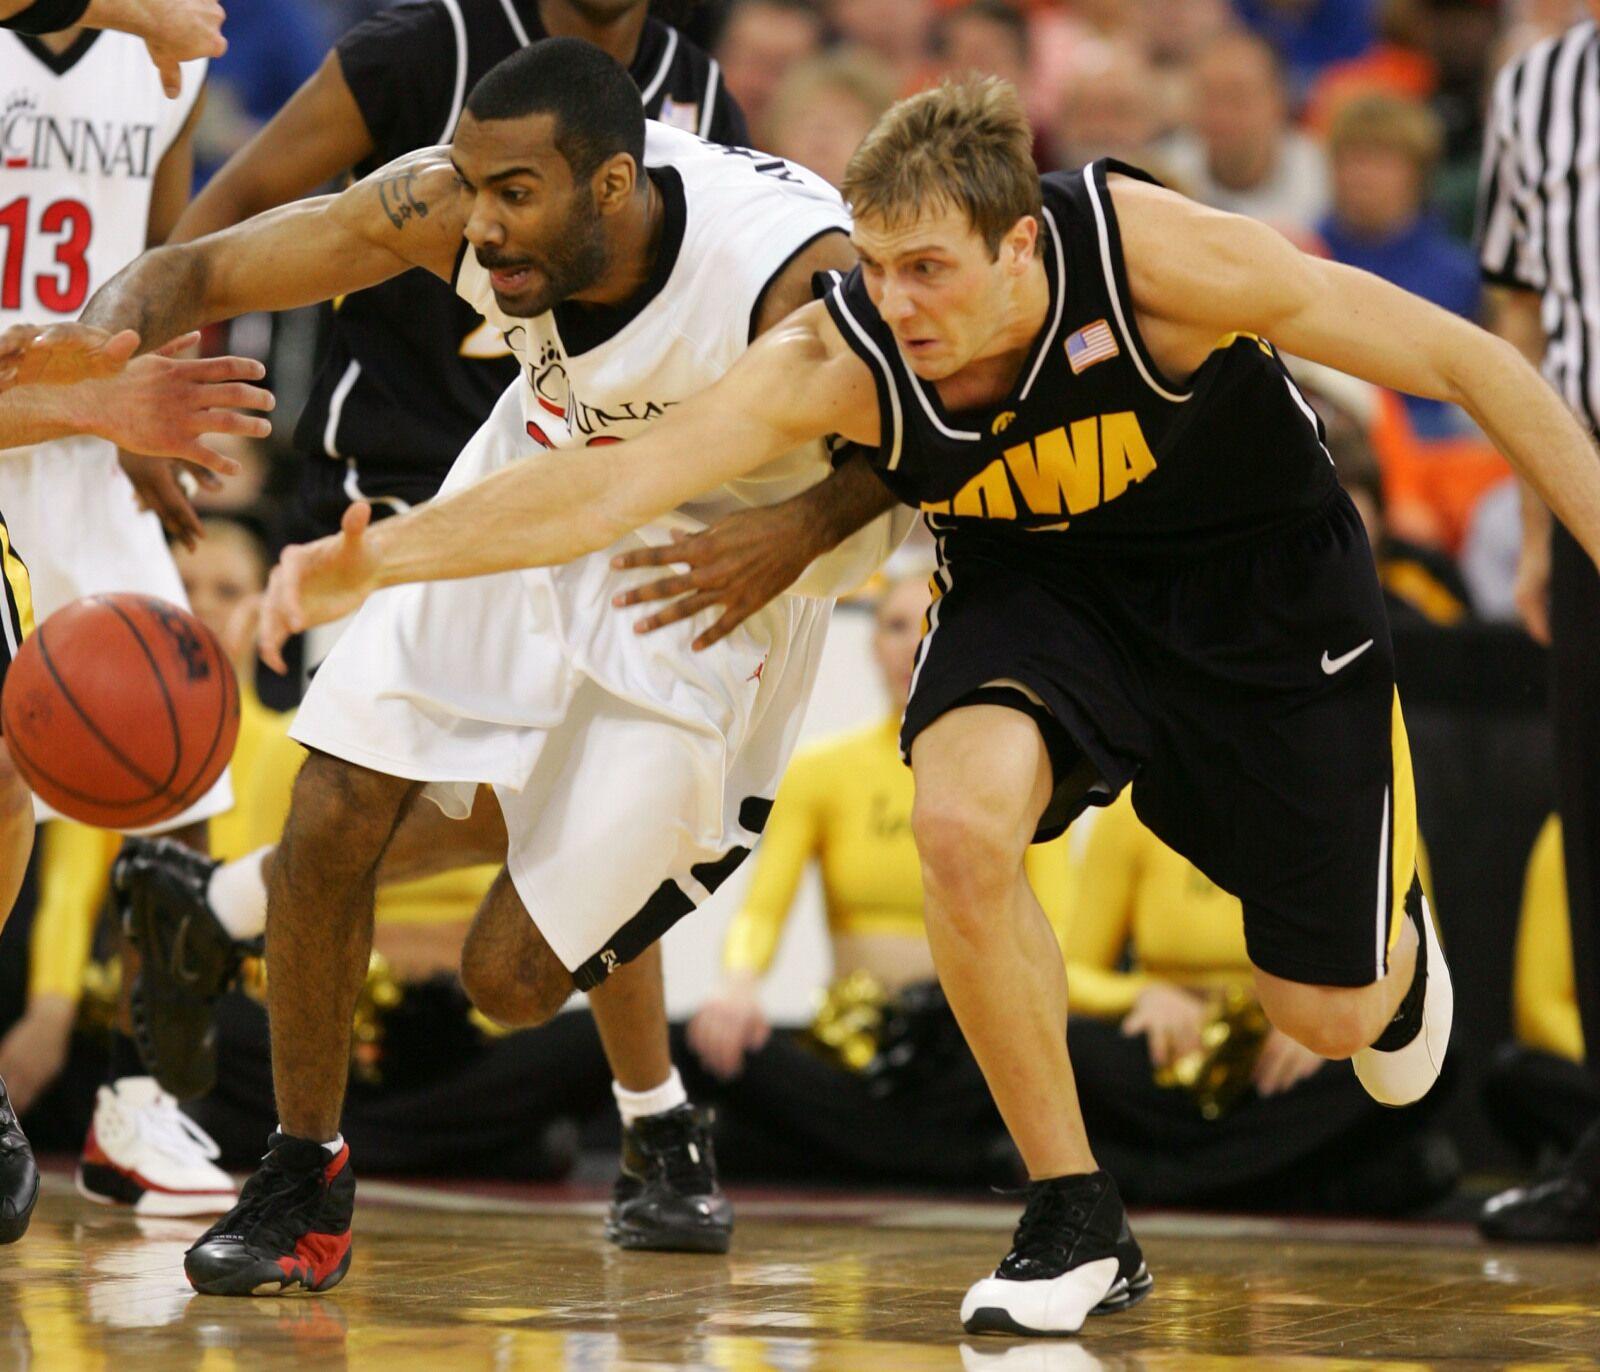 Iowa basketball: Hawks haven't beaten Bearcats since 1980